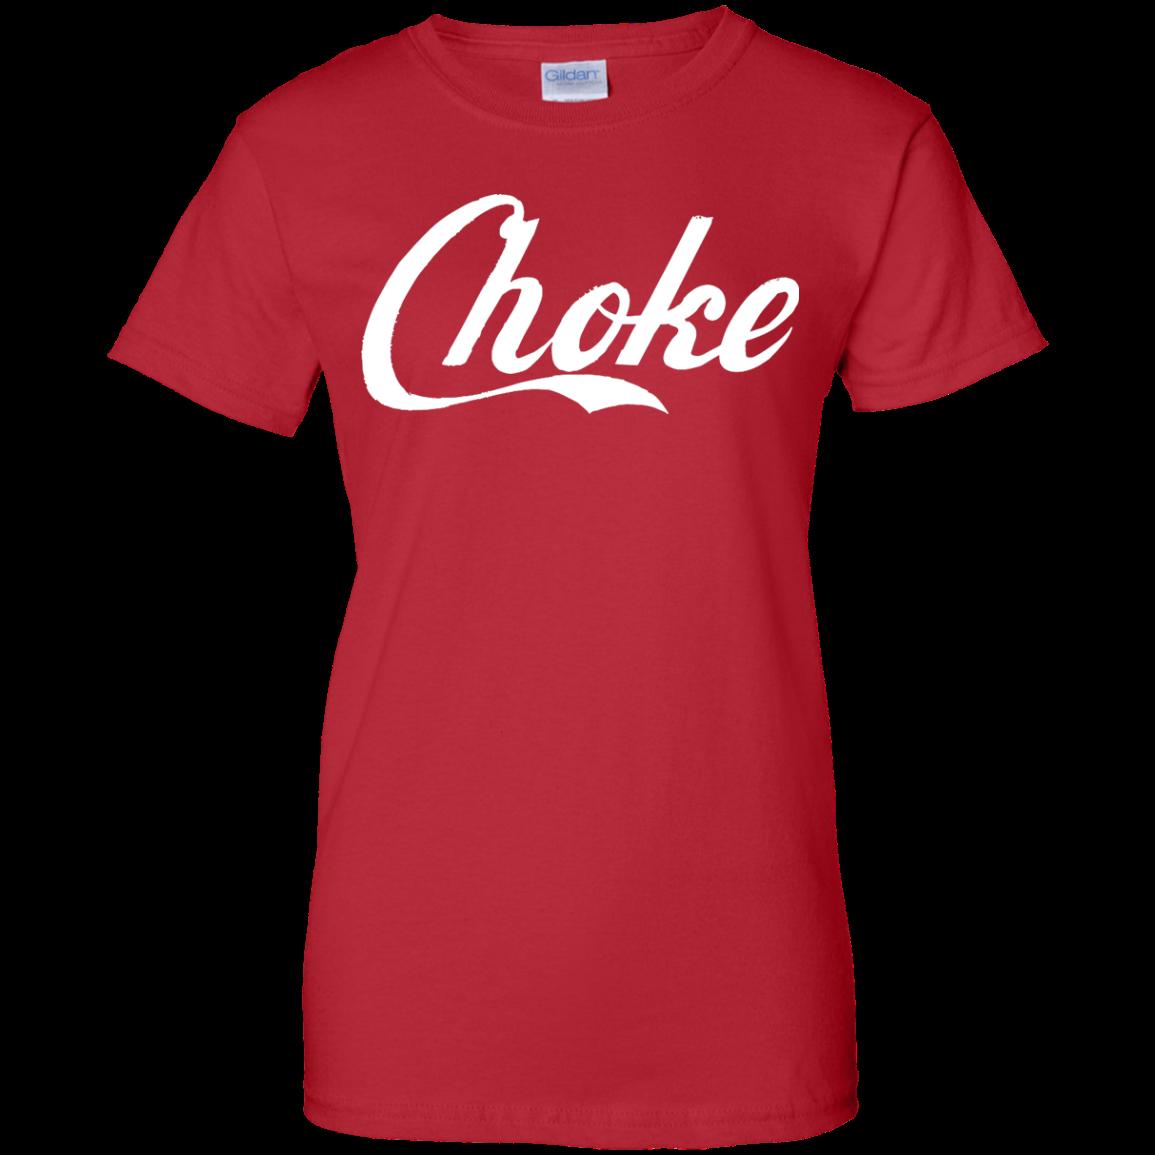 image 1024px Choke Shirt, Choke Logo Coca Cola T Shirts, Hoodies